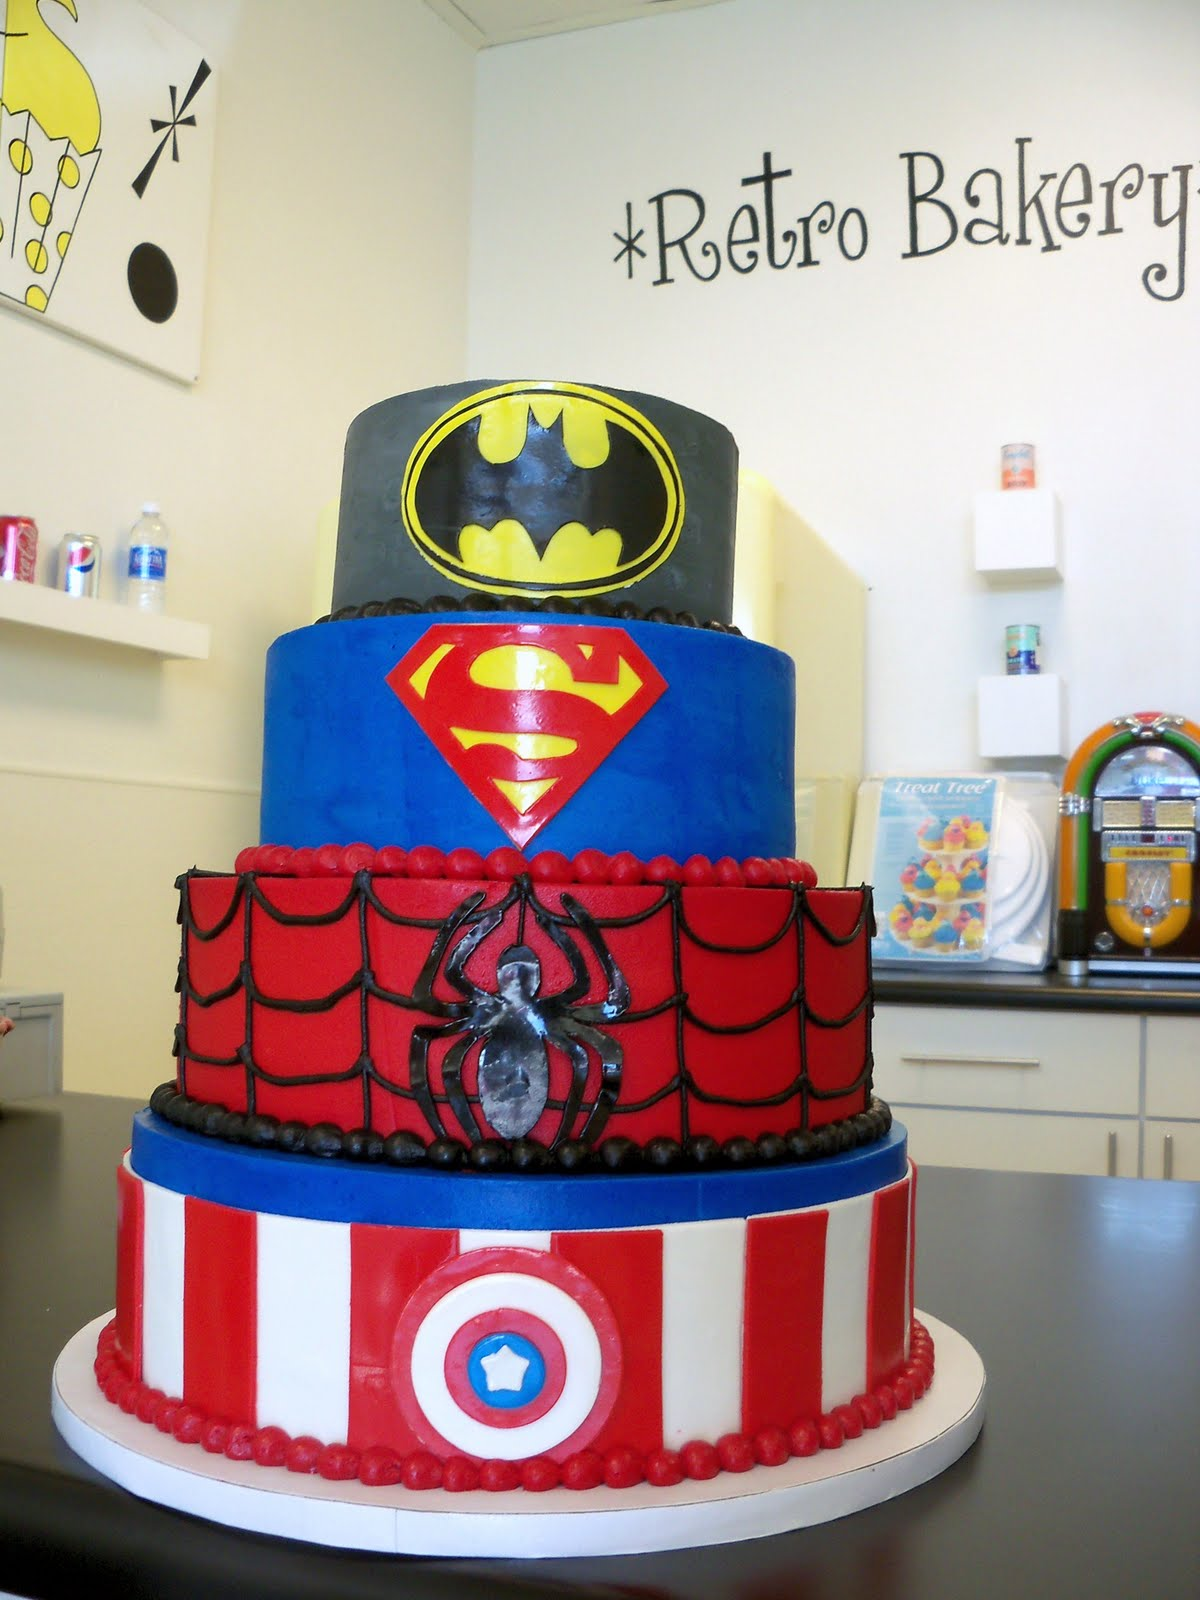 Single Layer Super Hero Cake Ideas 78637 | Superhero Cake Su